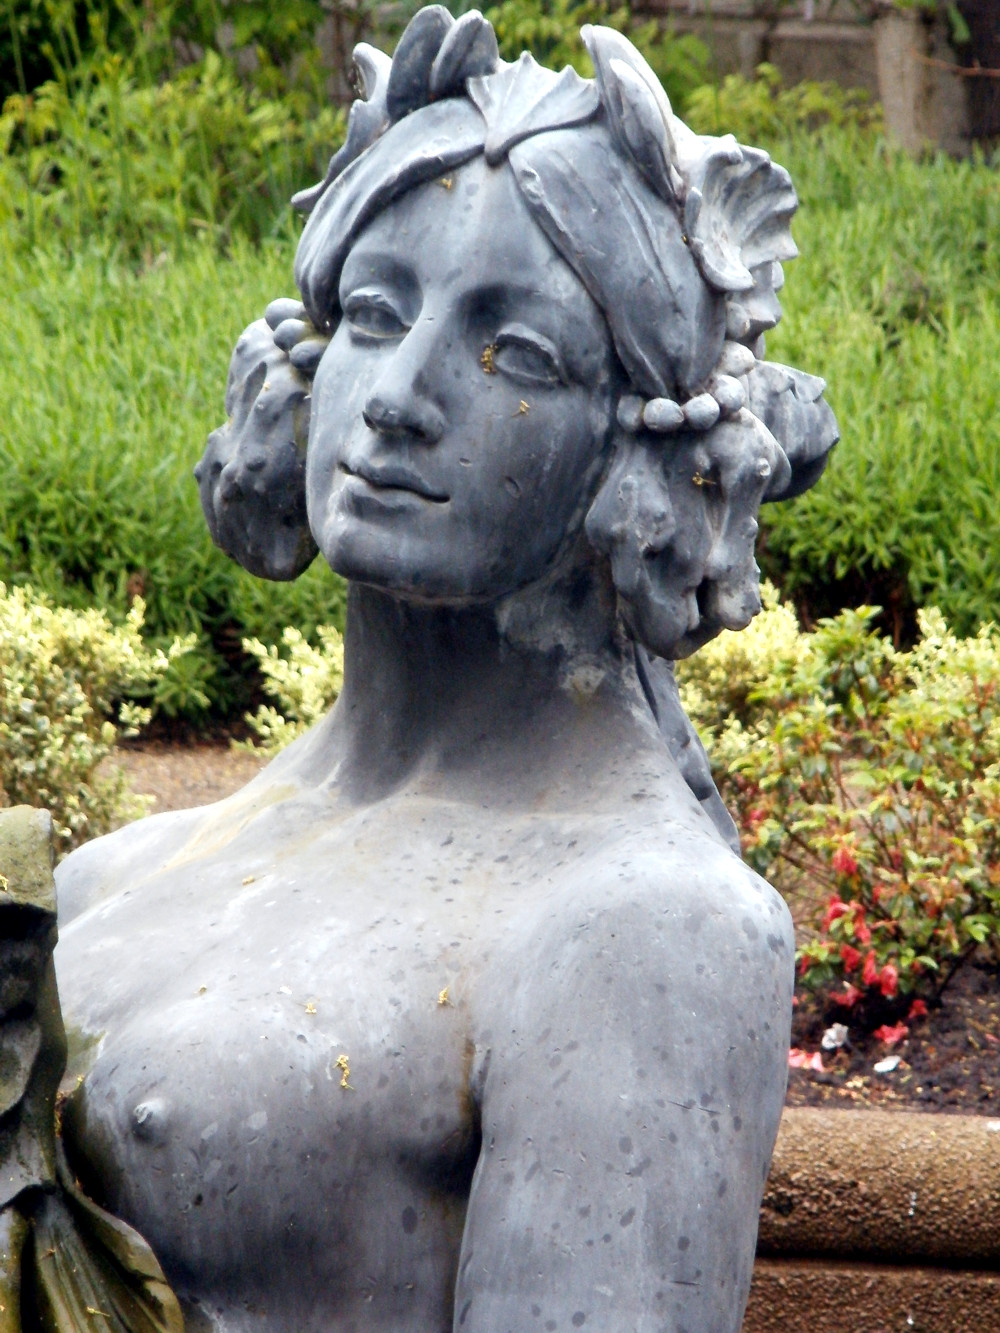 Southportu0027s Mermaid Statue